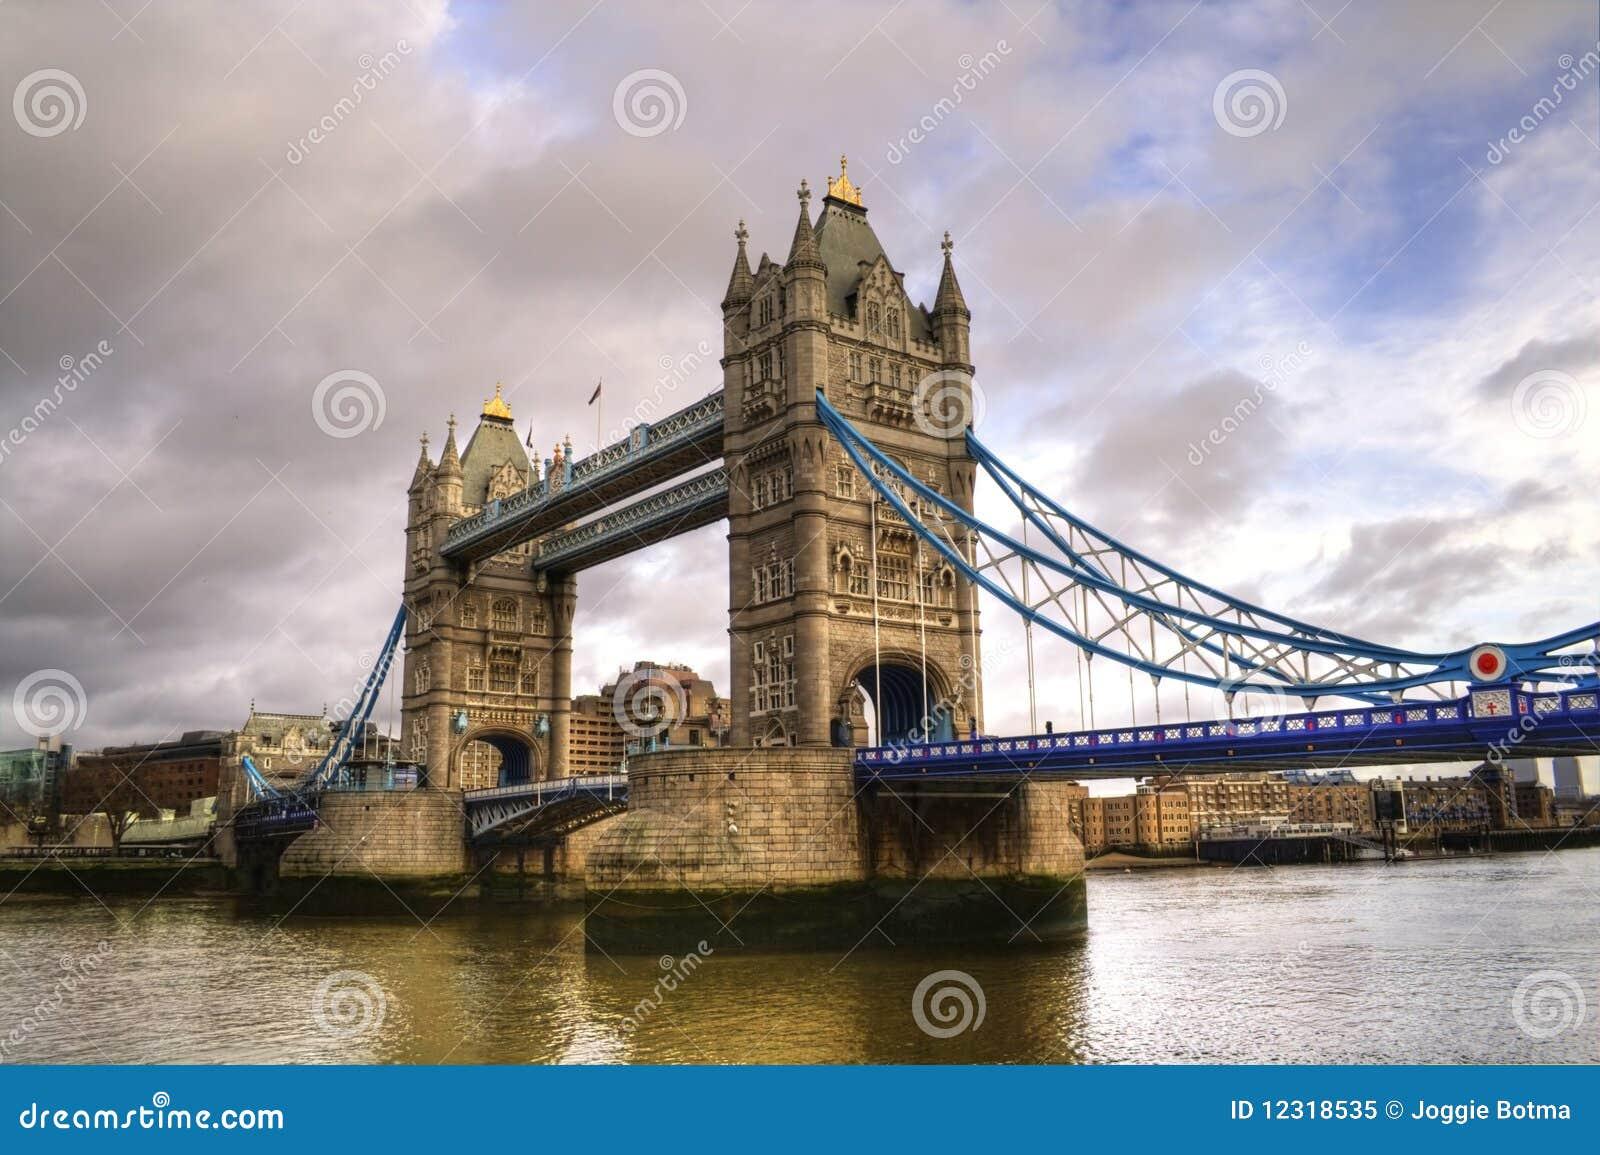 hdr old bridge and - photo #40